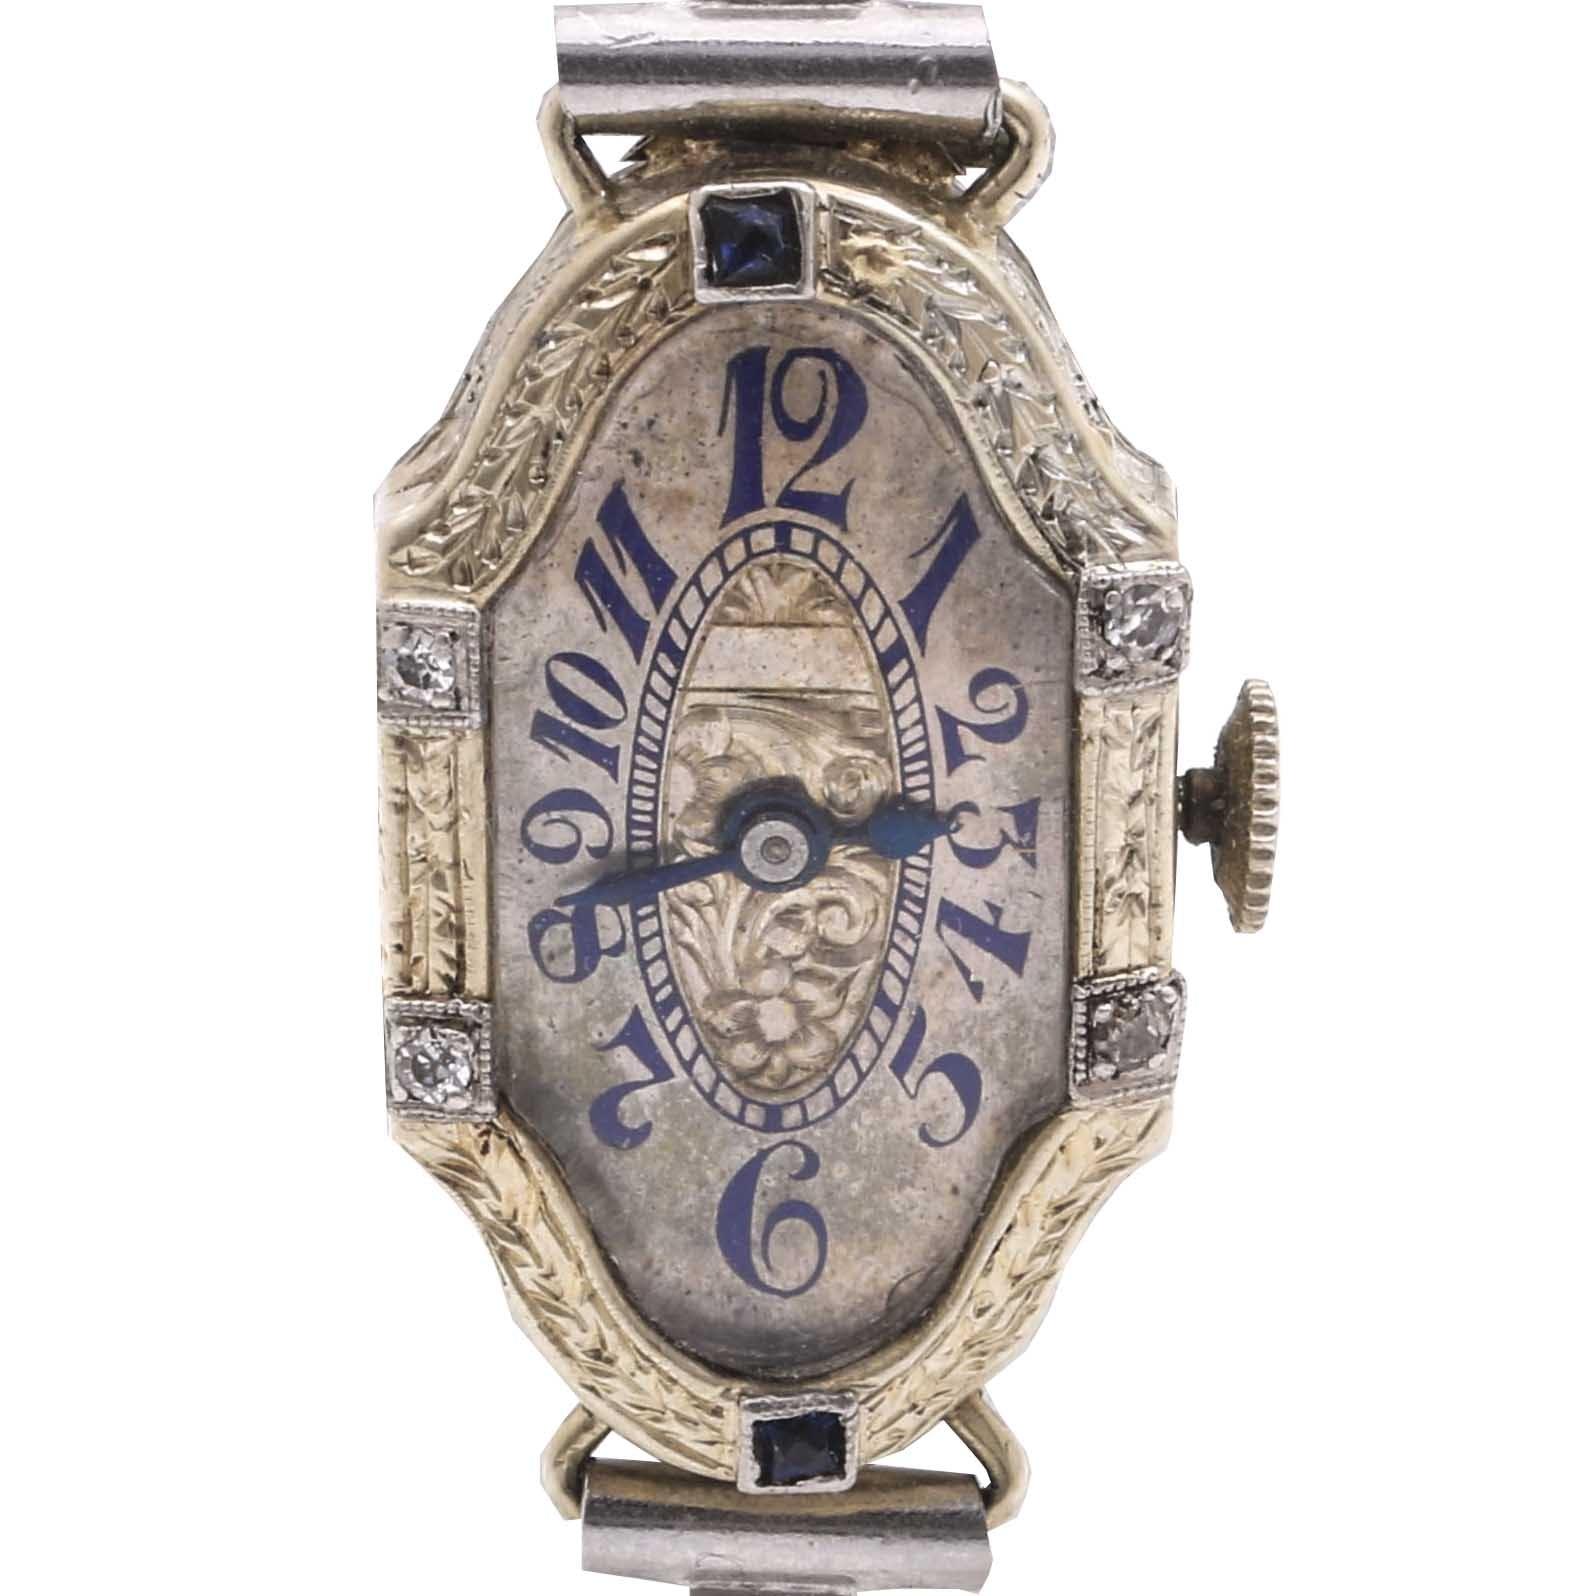 Antique 20K White Gold with Platinum Trim Diamond and Sapphire Wristwatch